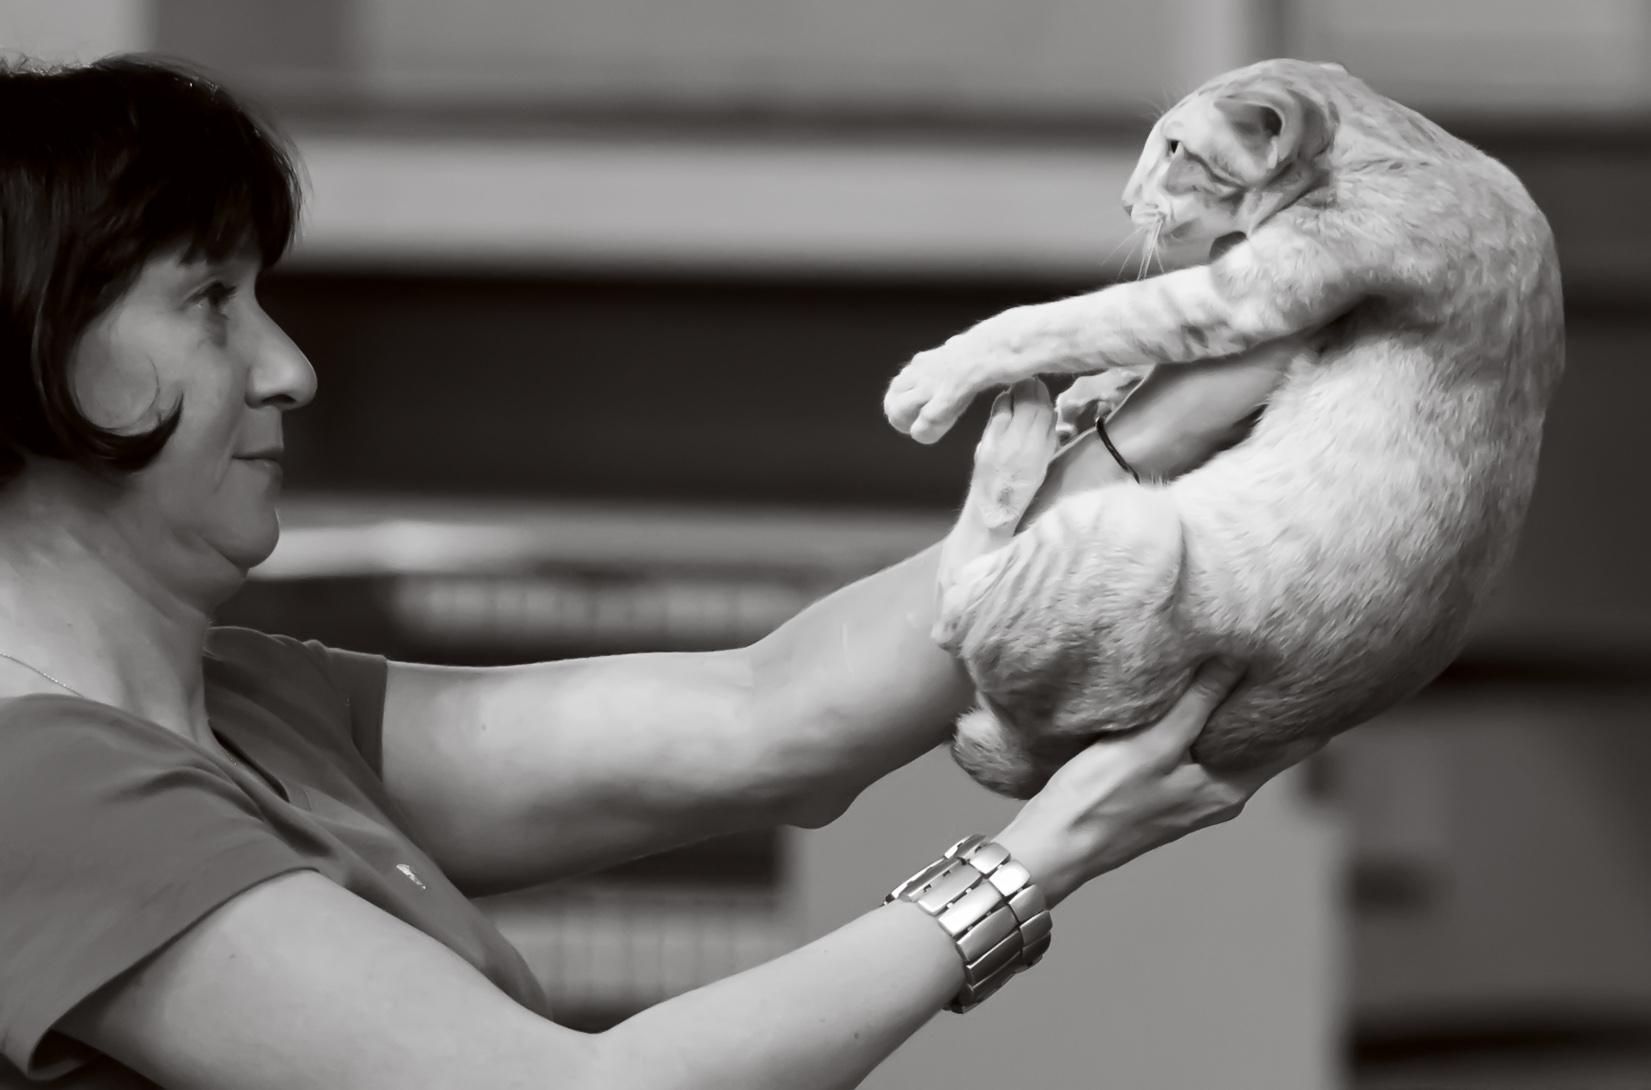 HU*Shagio-Chen Legolas for Keskimaan (Lee) [OSH d 24], kuva 211225, 24.8.2013